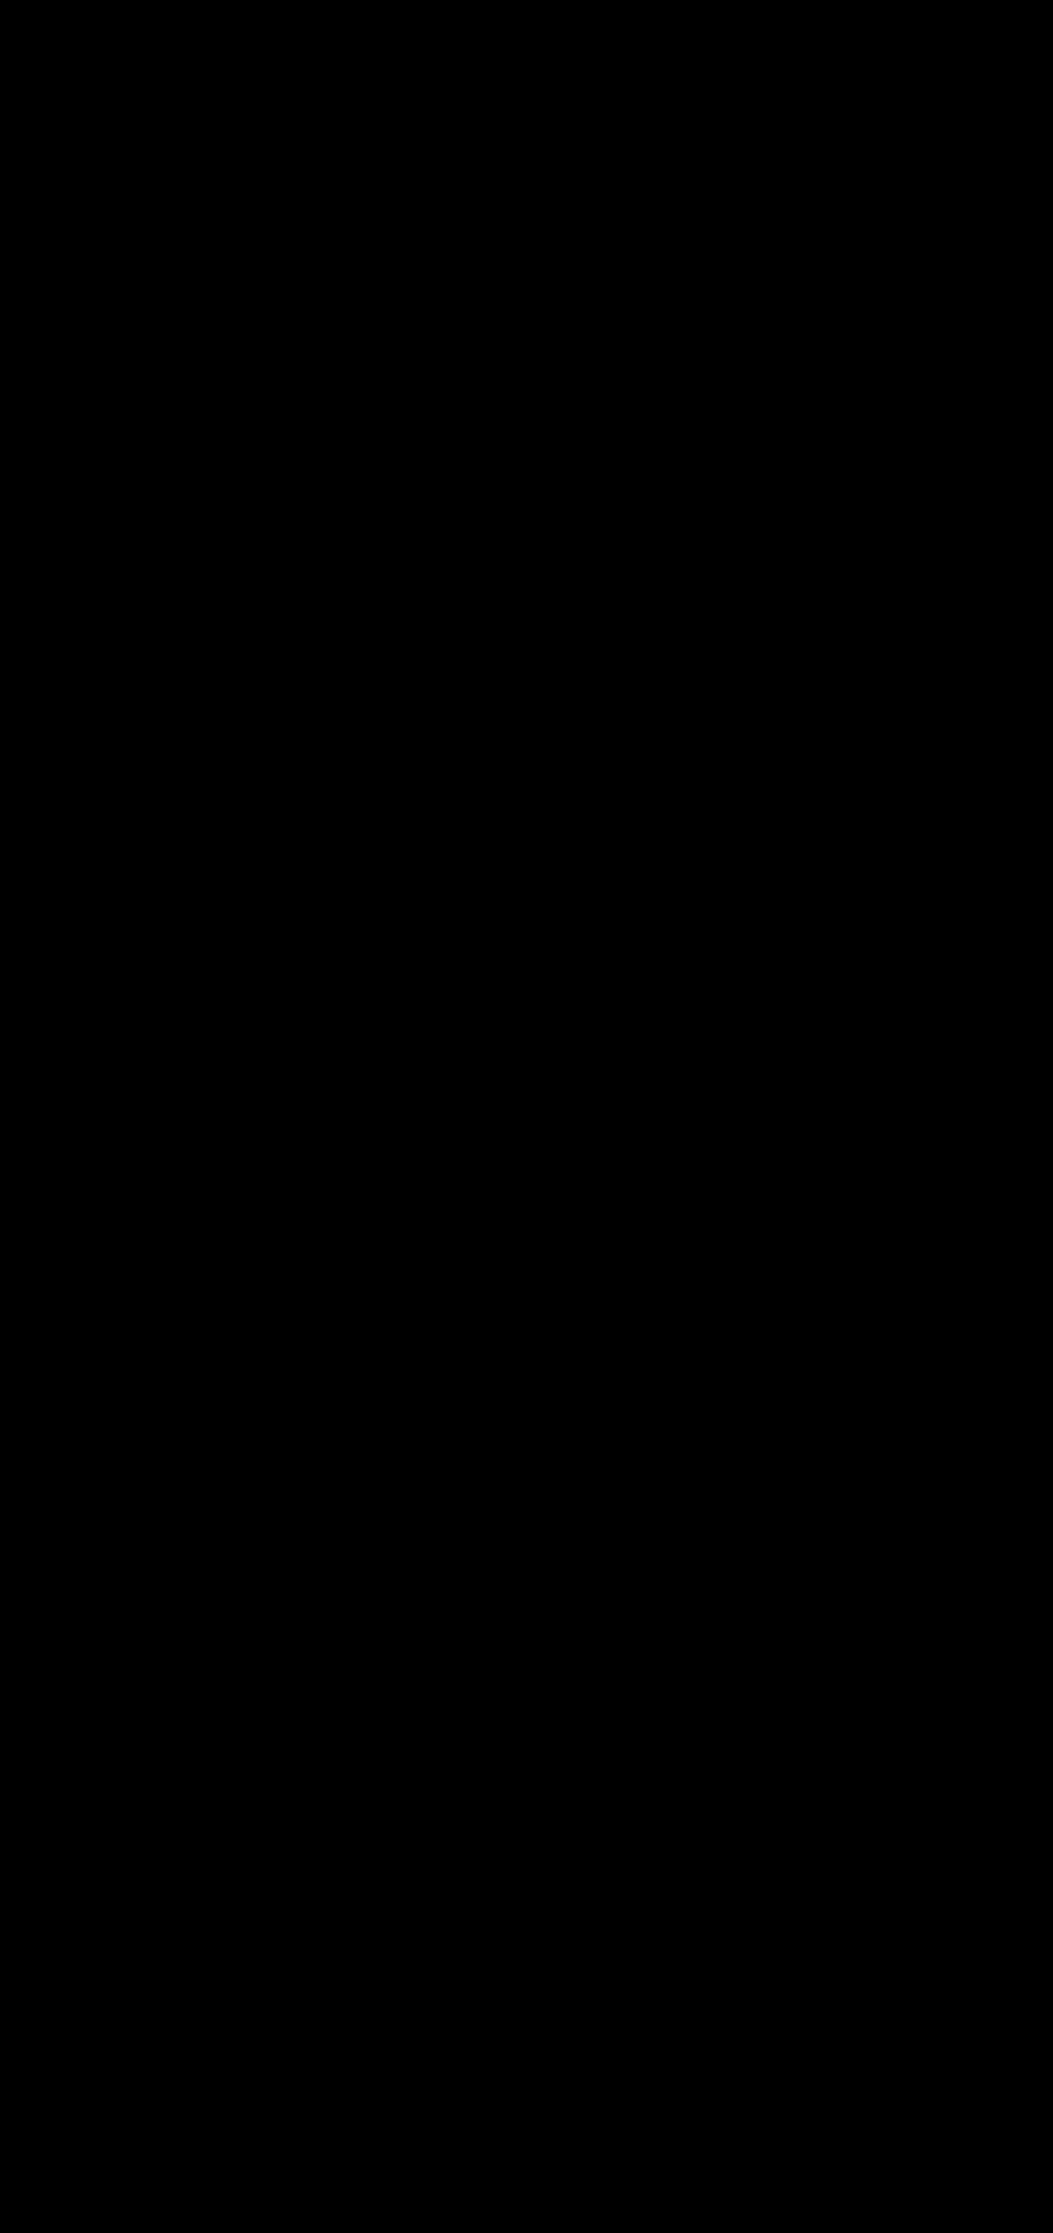 2 Window Clipart